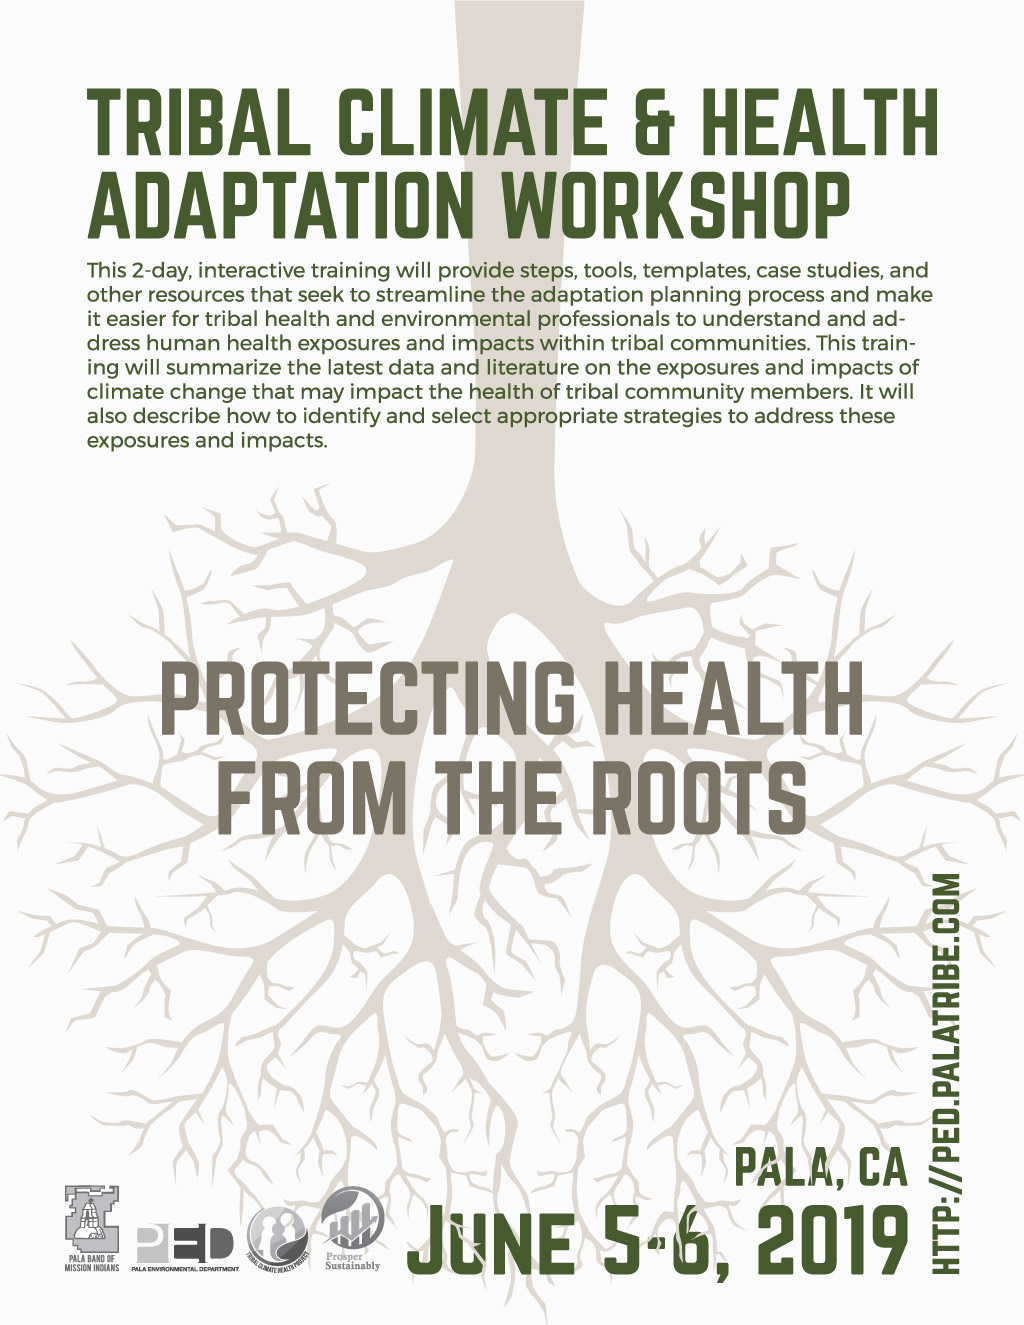 Pala Environmental Department Tribal Climate Adaptation Workshop 2019